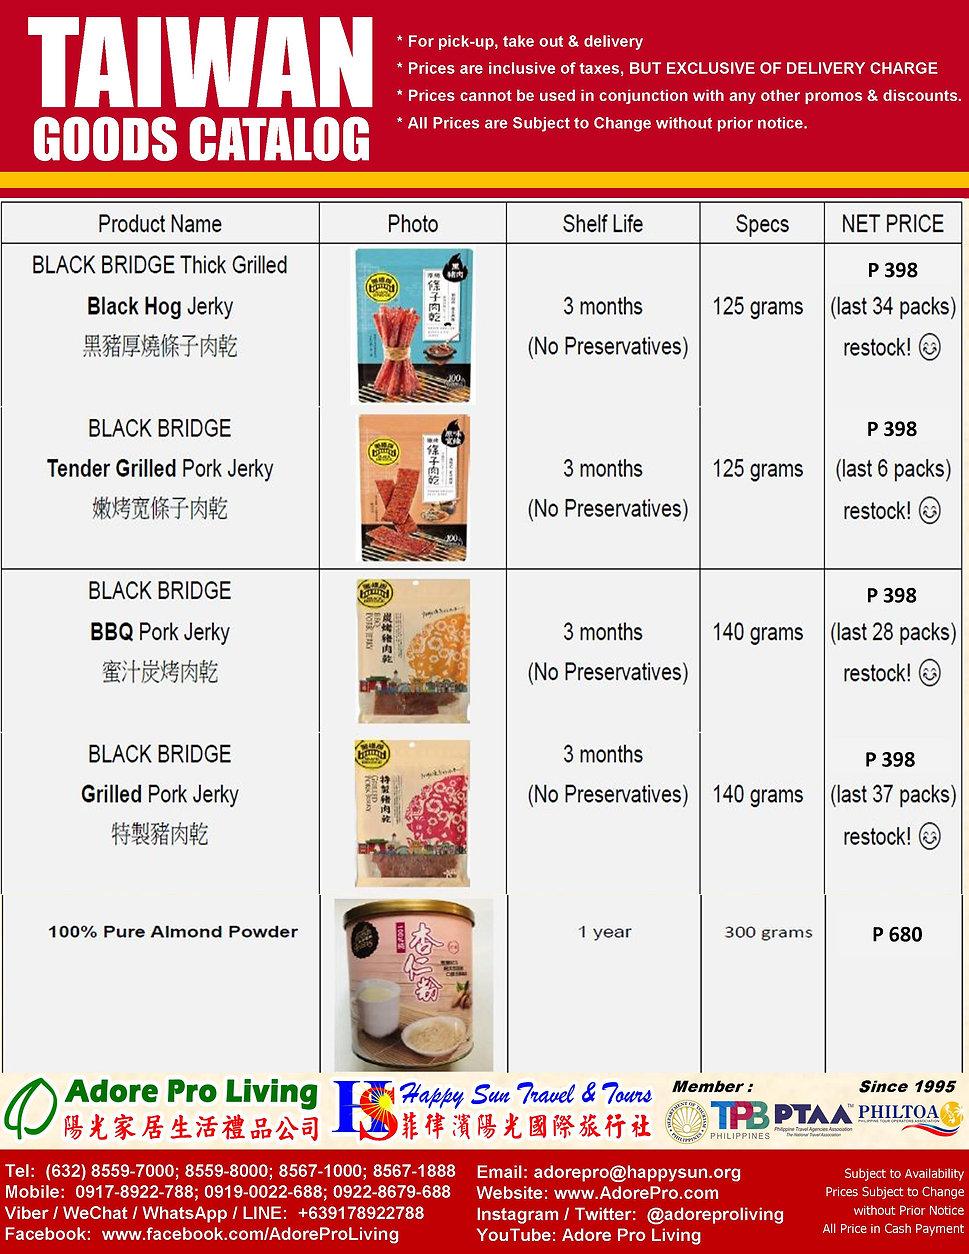 P22_Taiwan Goods Catalog_20200929.jpg